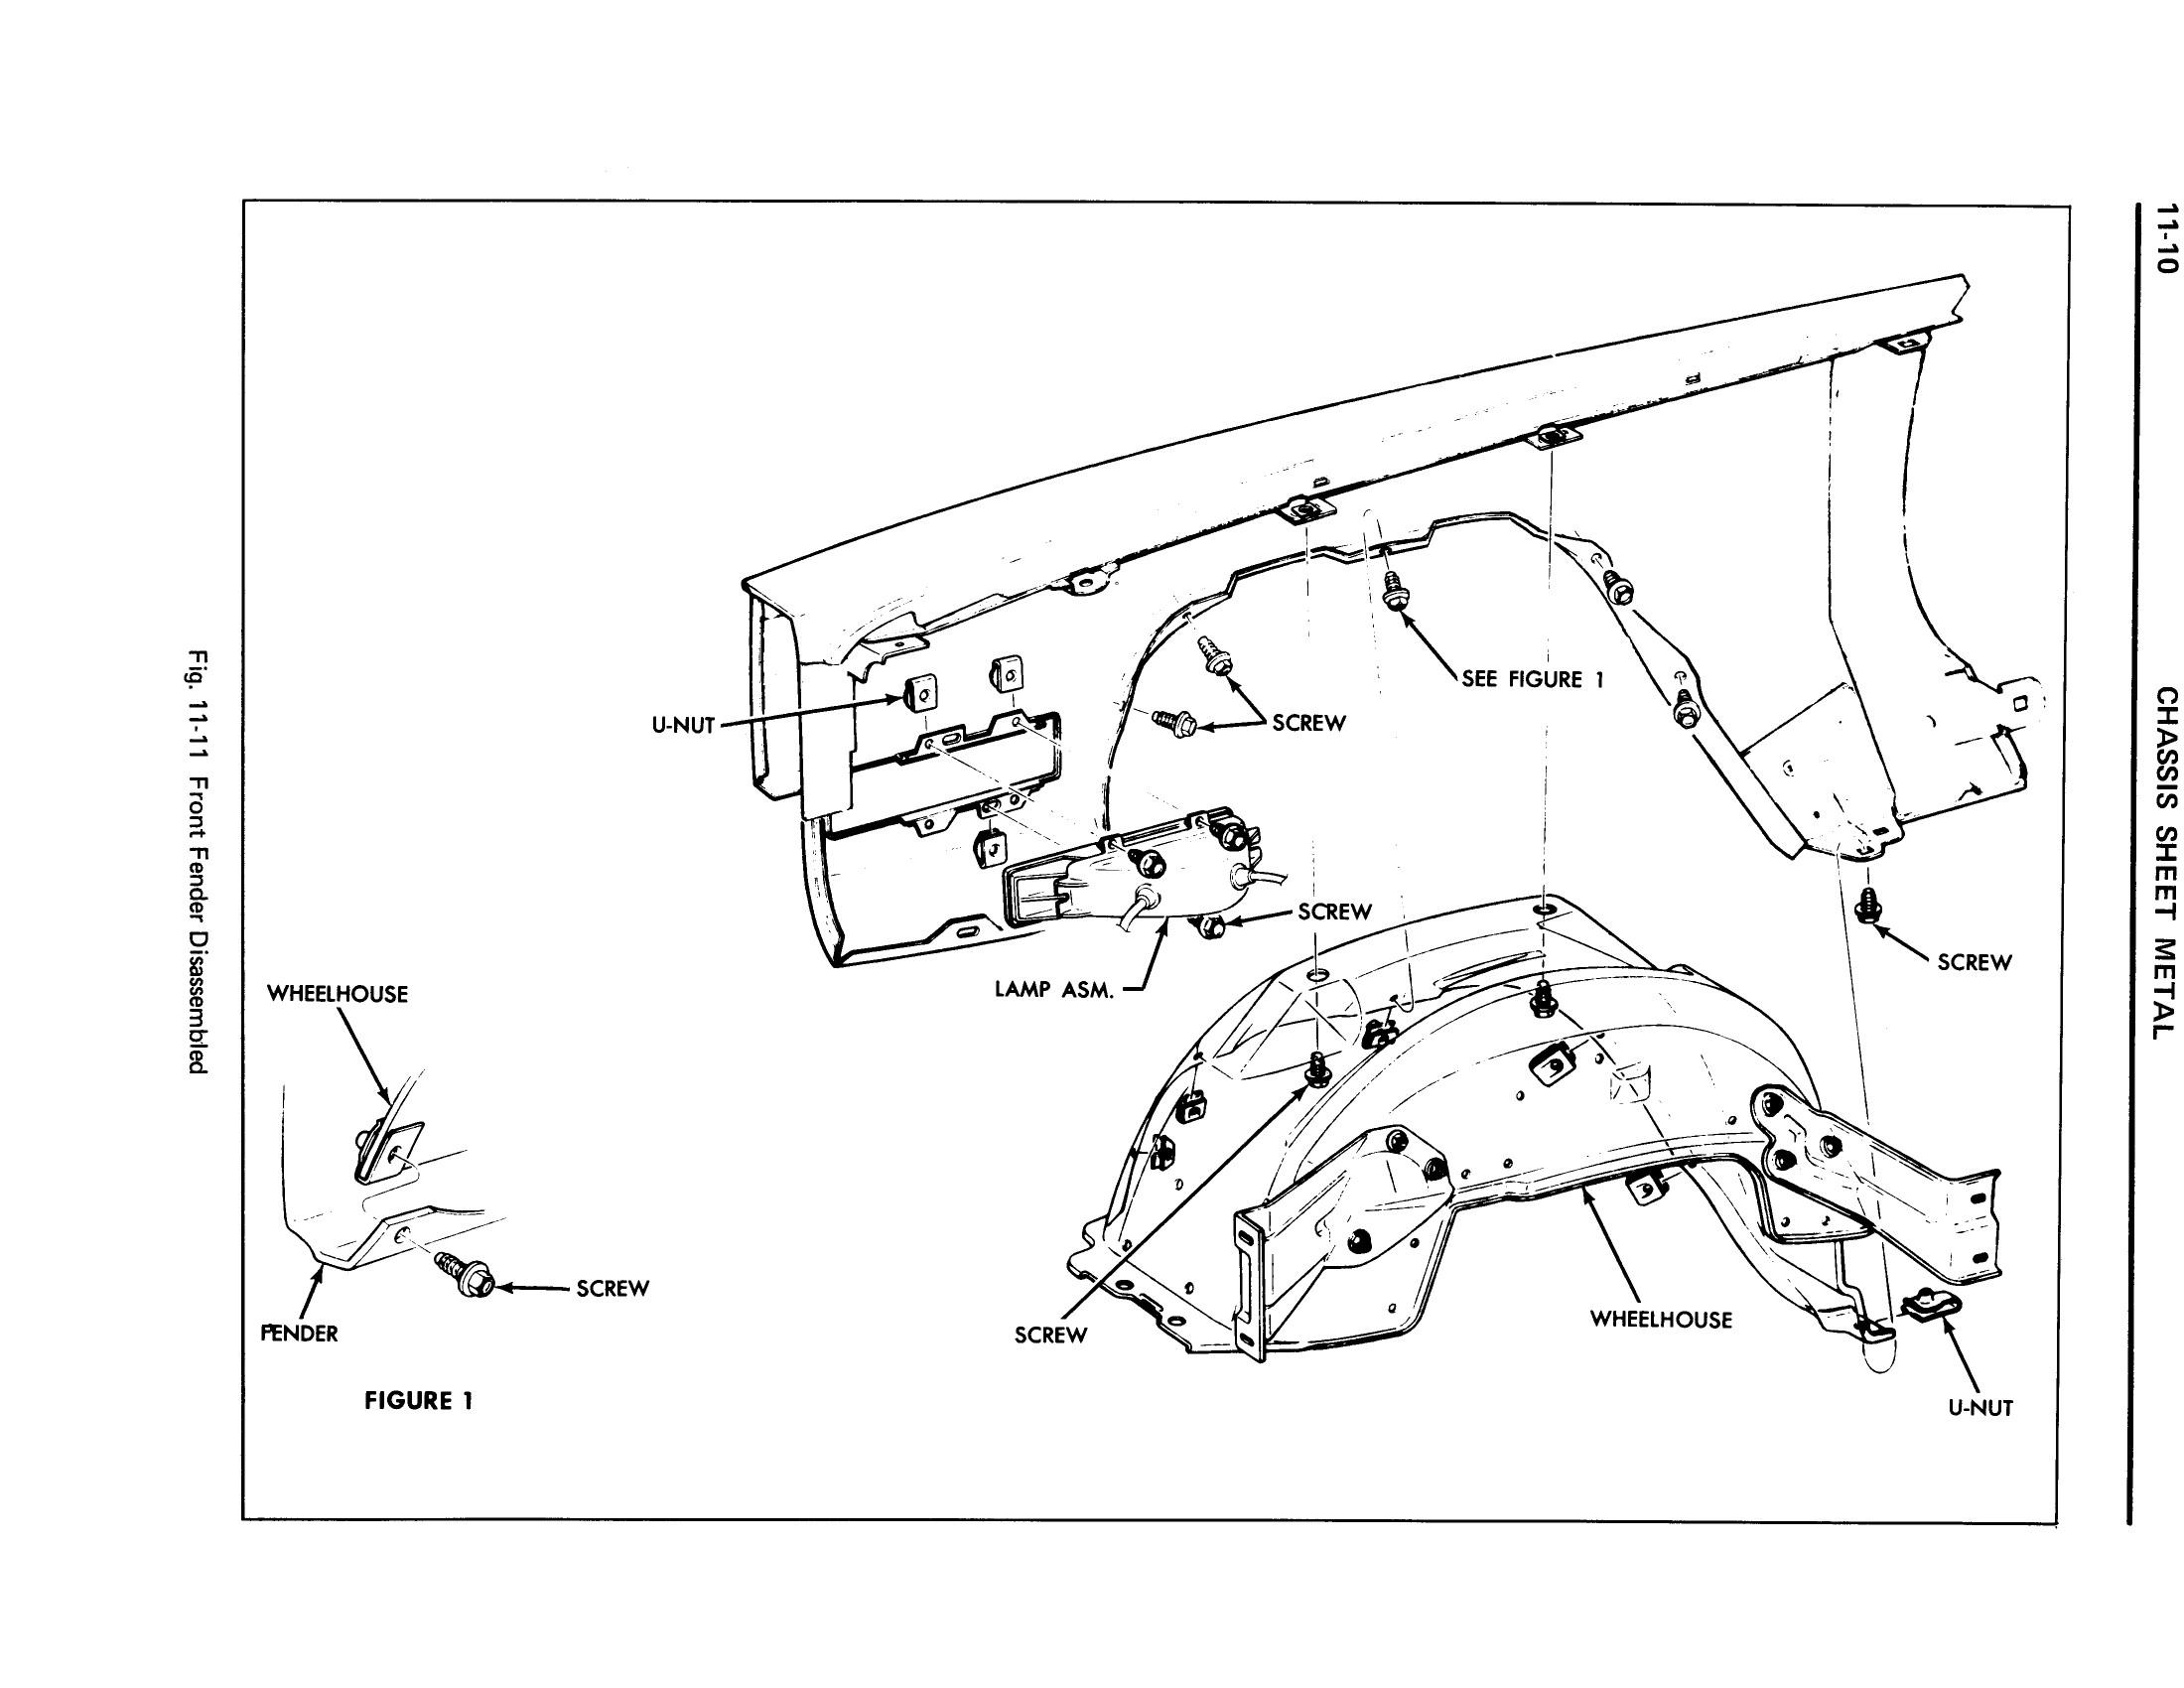 1971 Cadillac Shop Manual- Chassis Sheet Metal Page 10 of 12